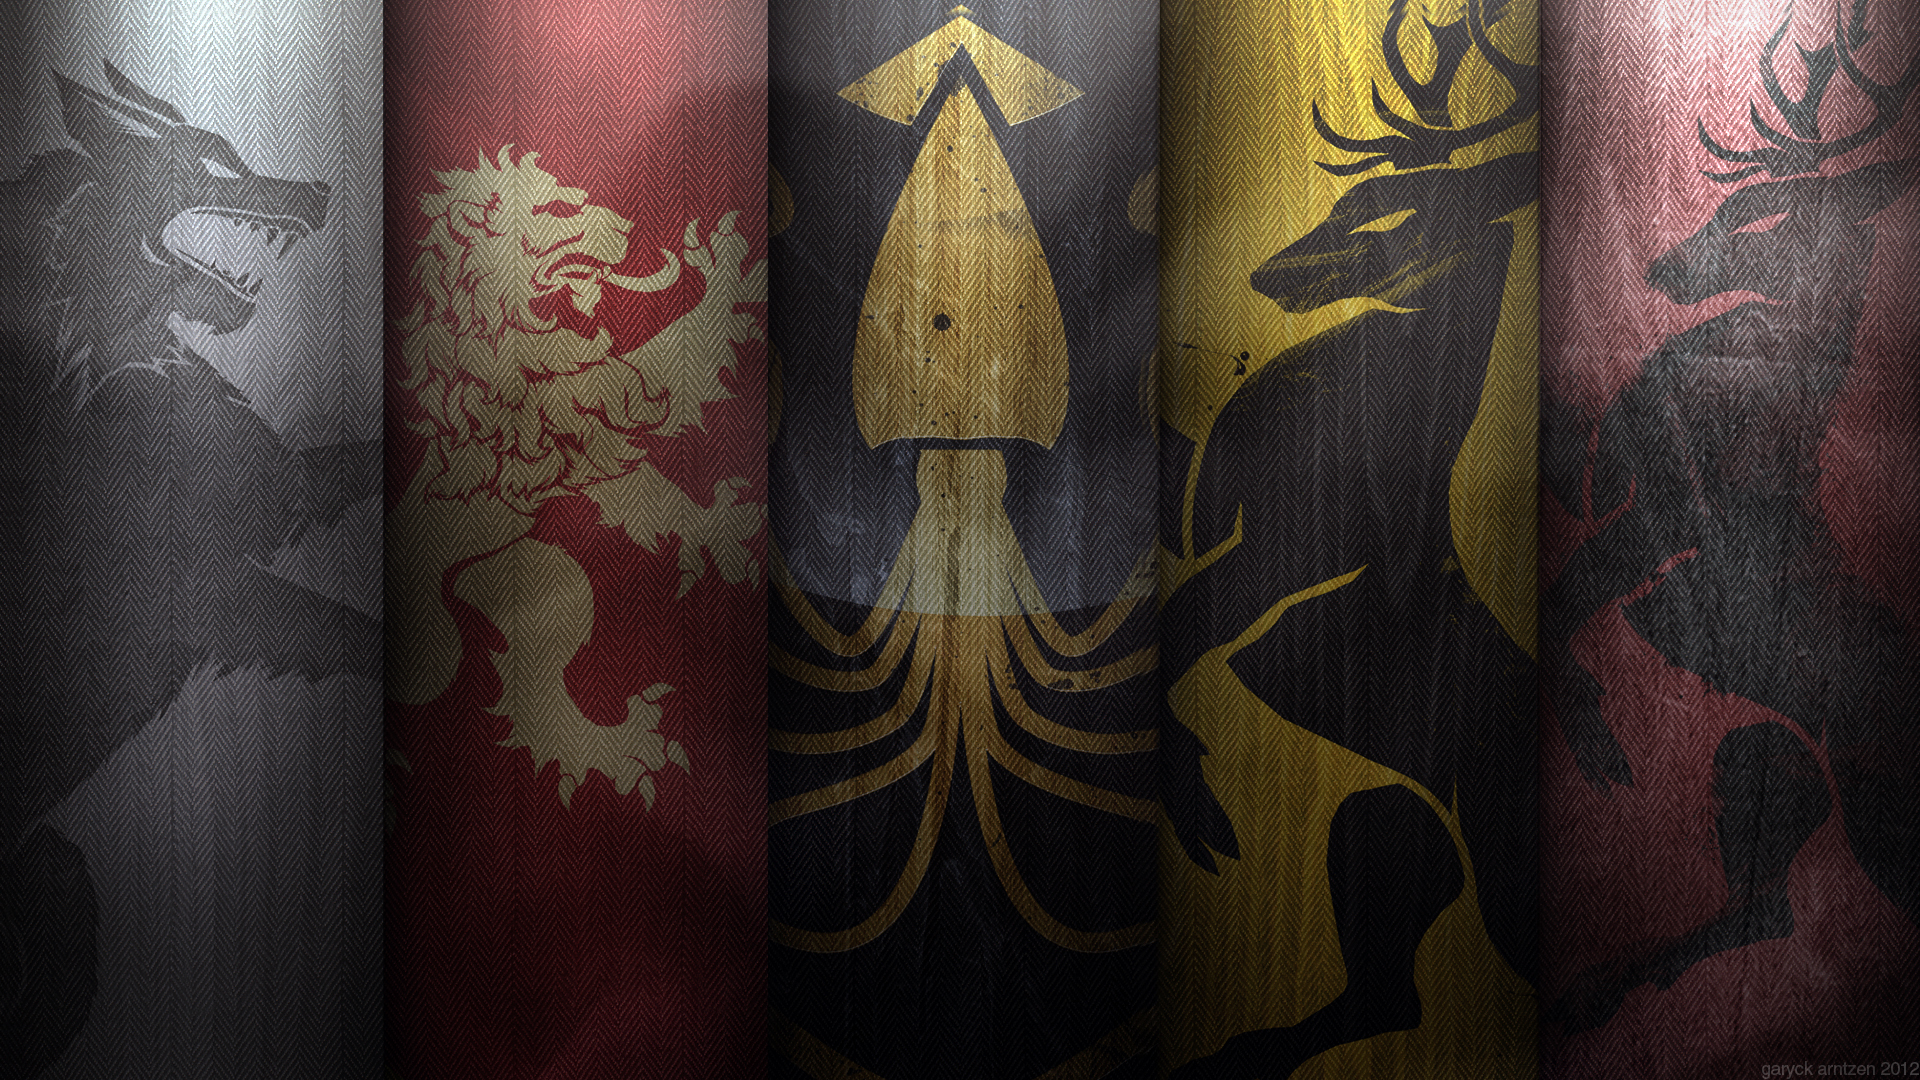 Description Game of Thrones Wallpaper 1080p is a hi res Wallpaper for 1920x1080